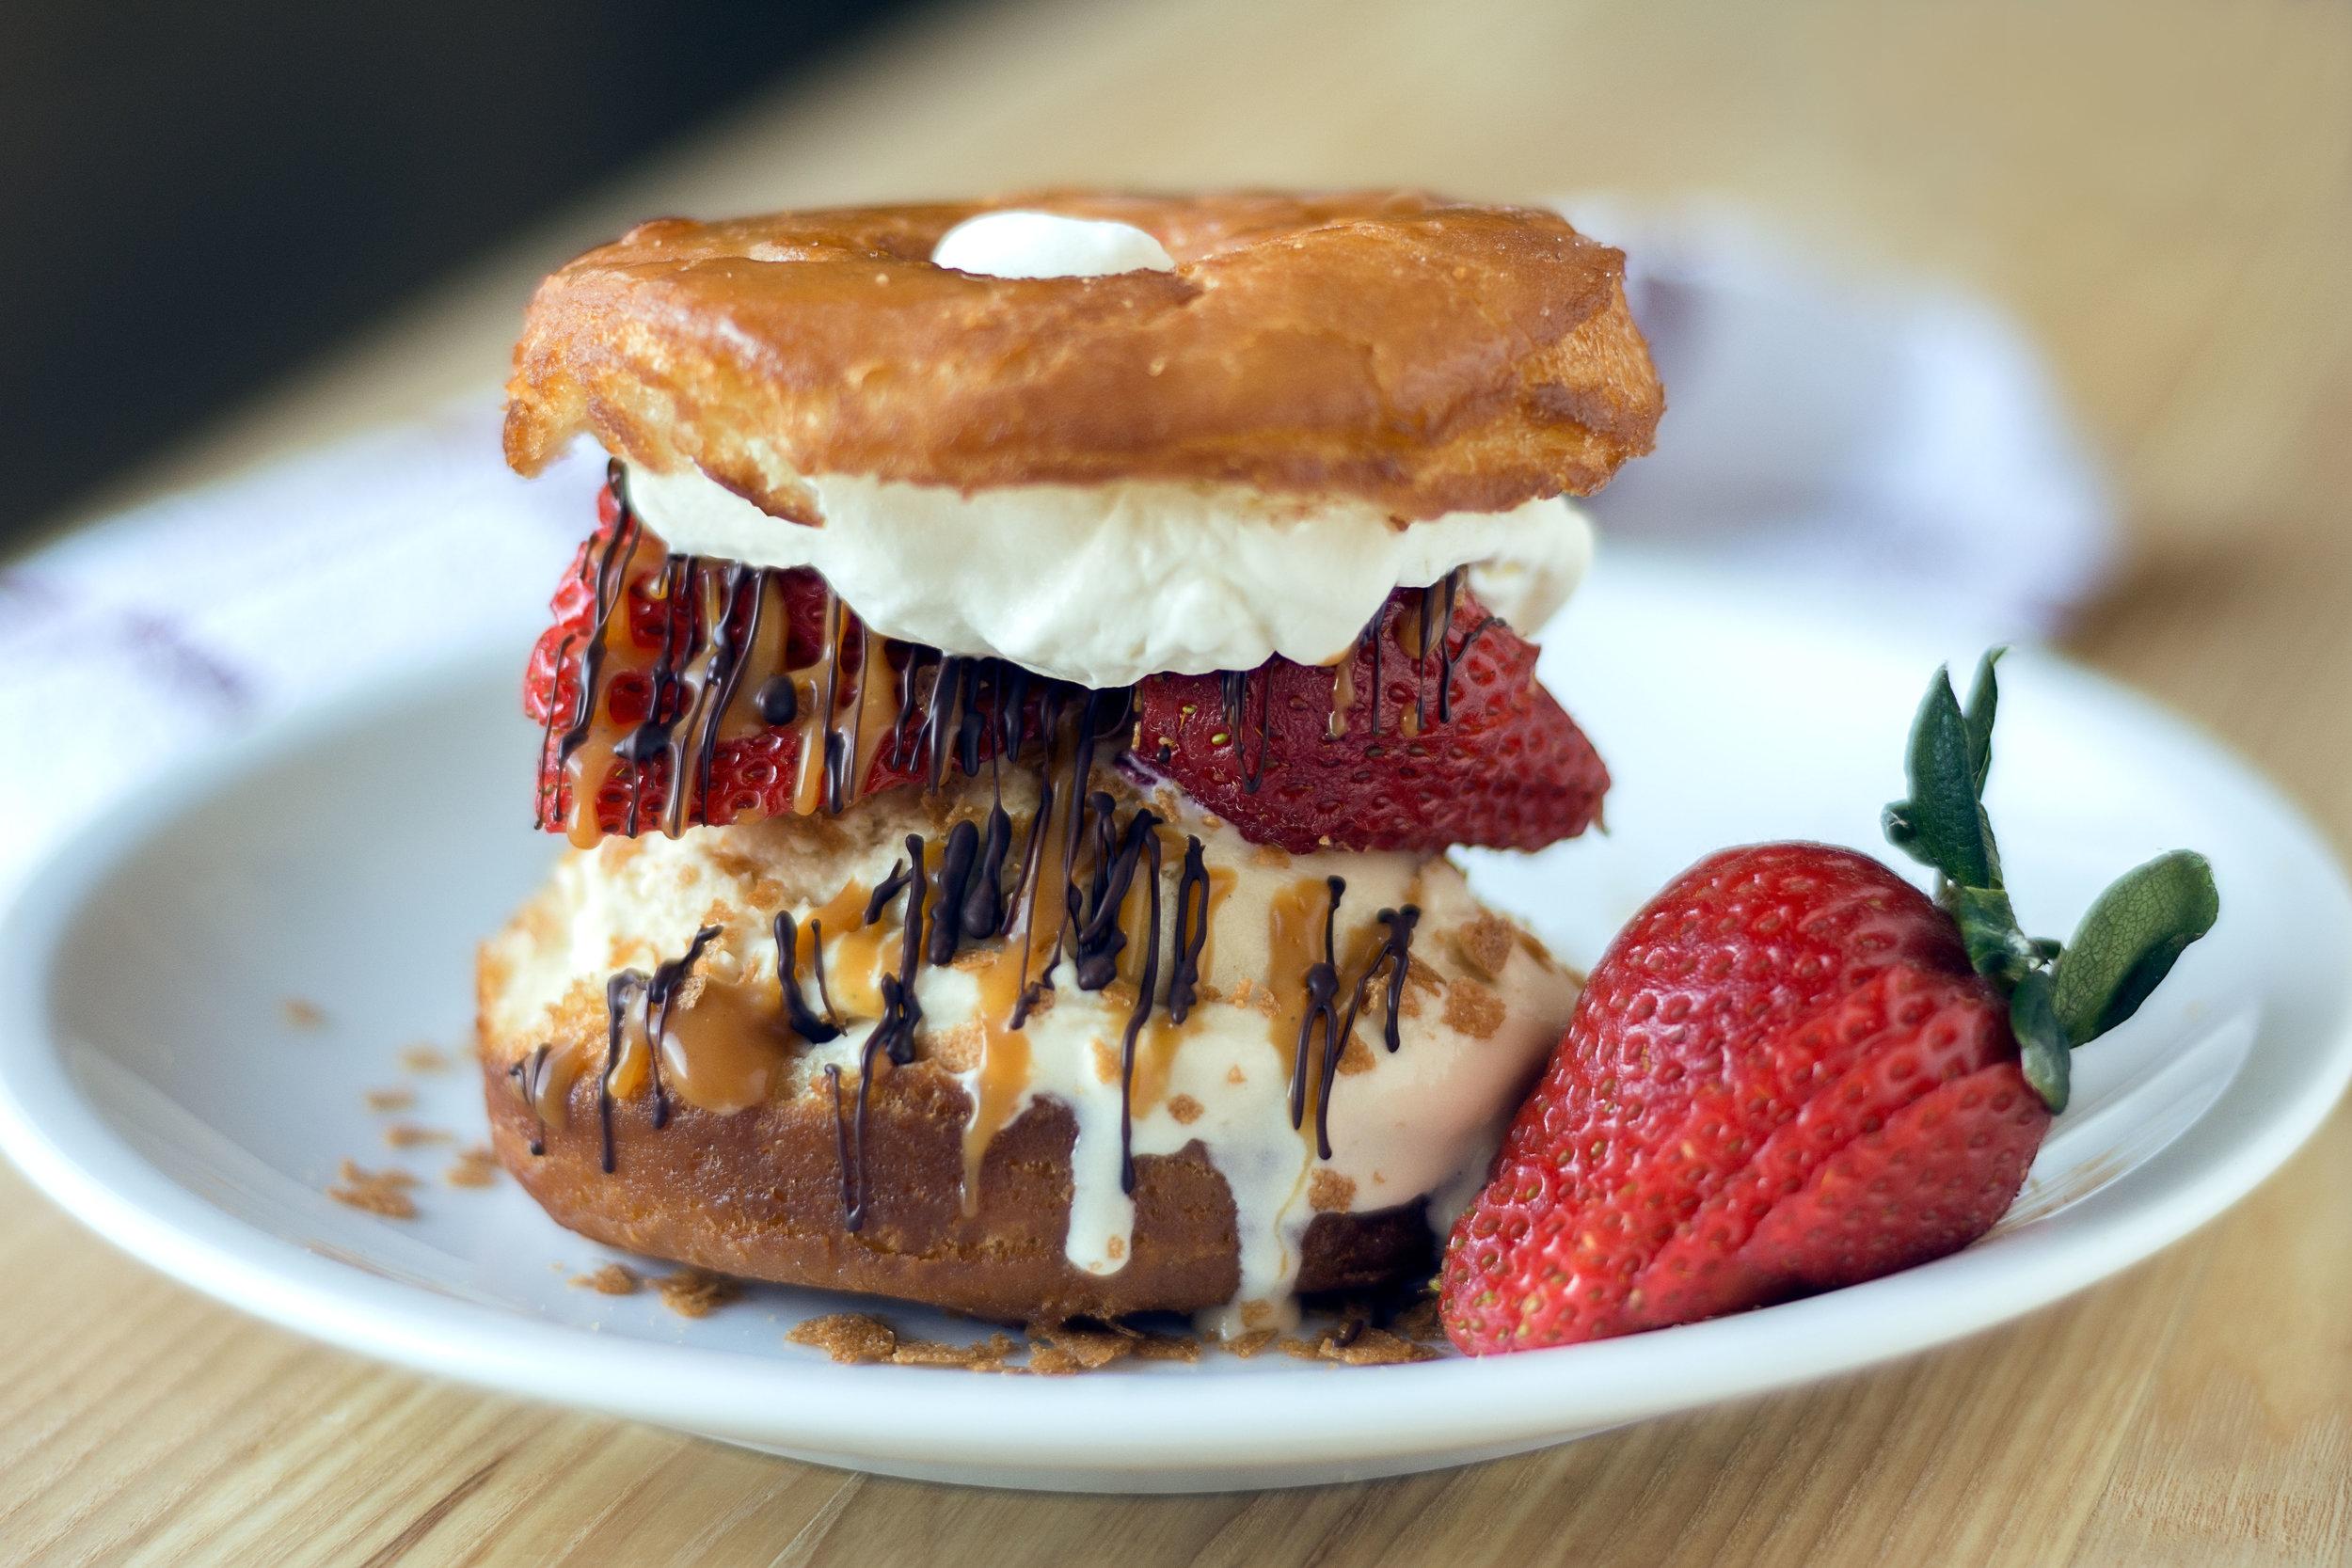 Donut ice cream sandwich